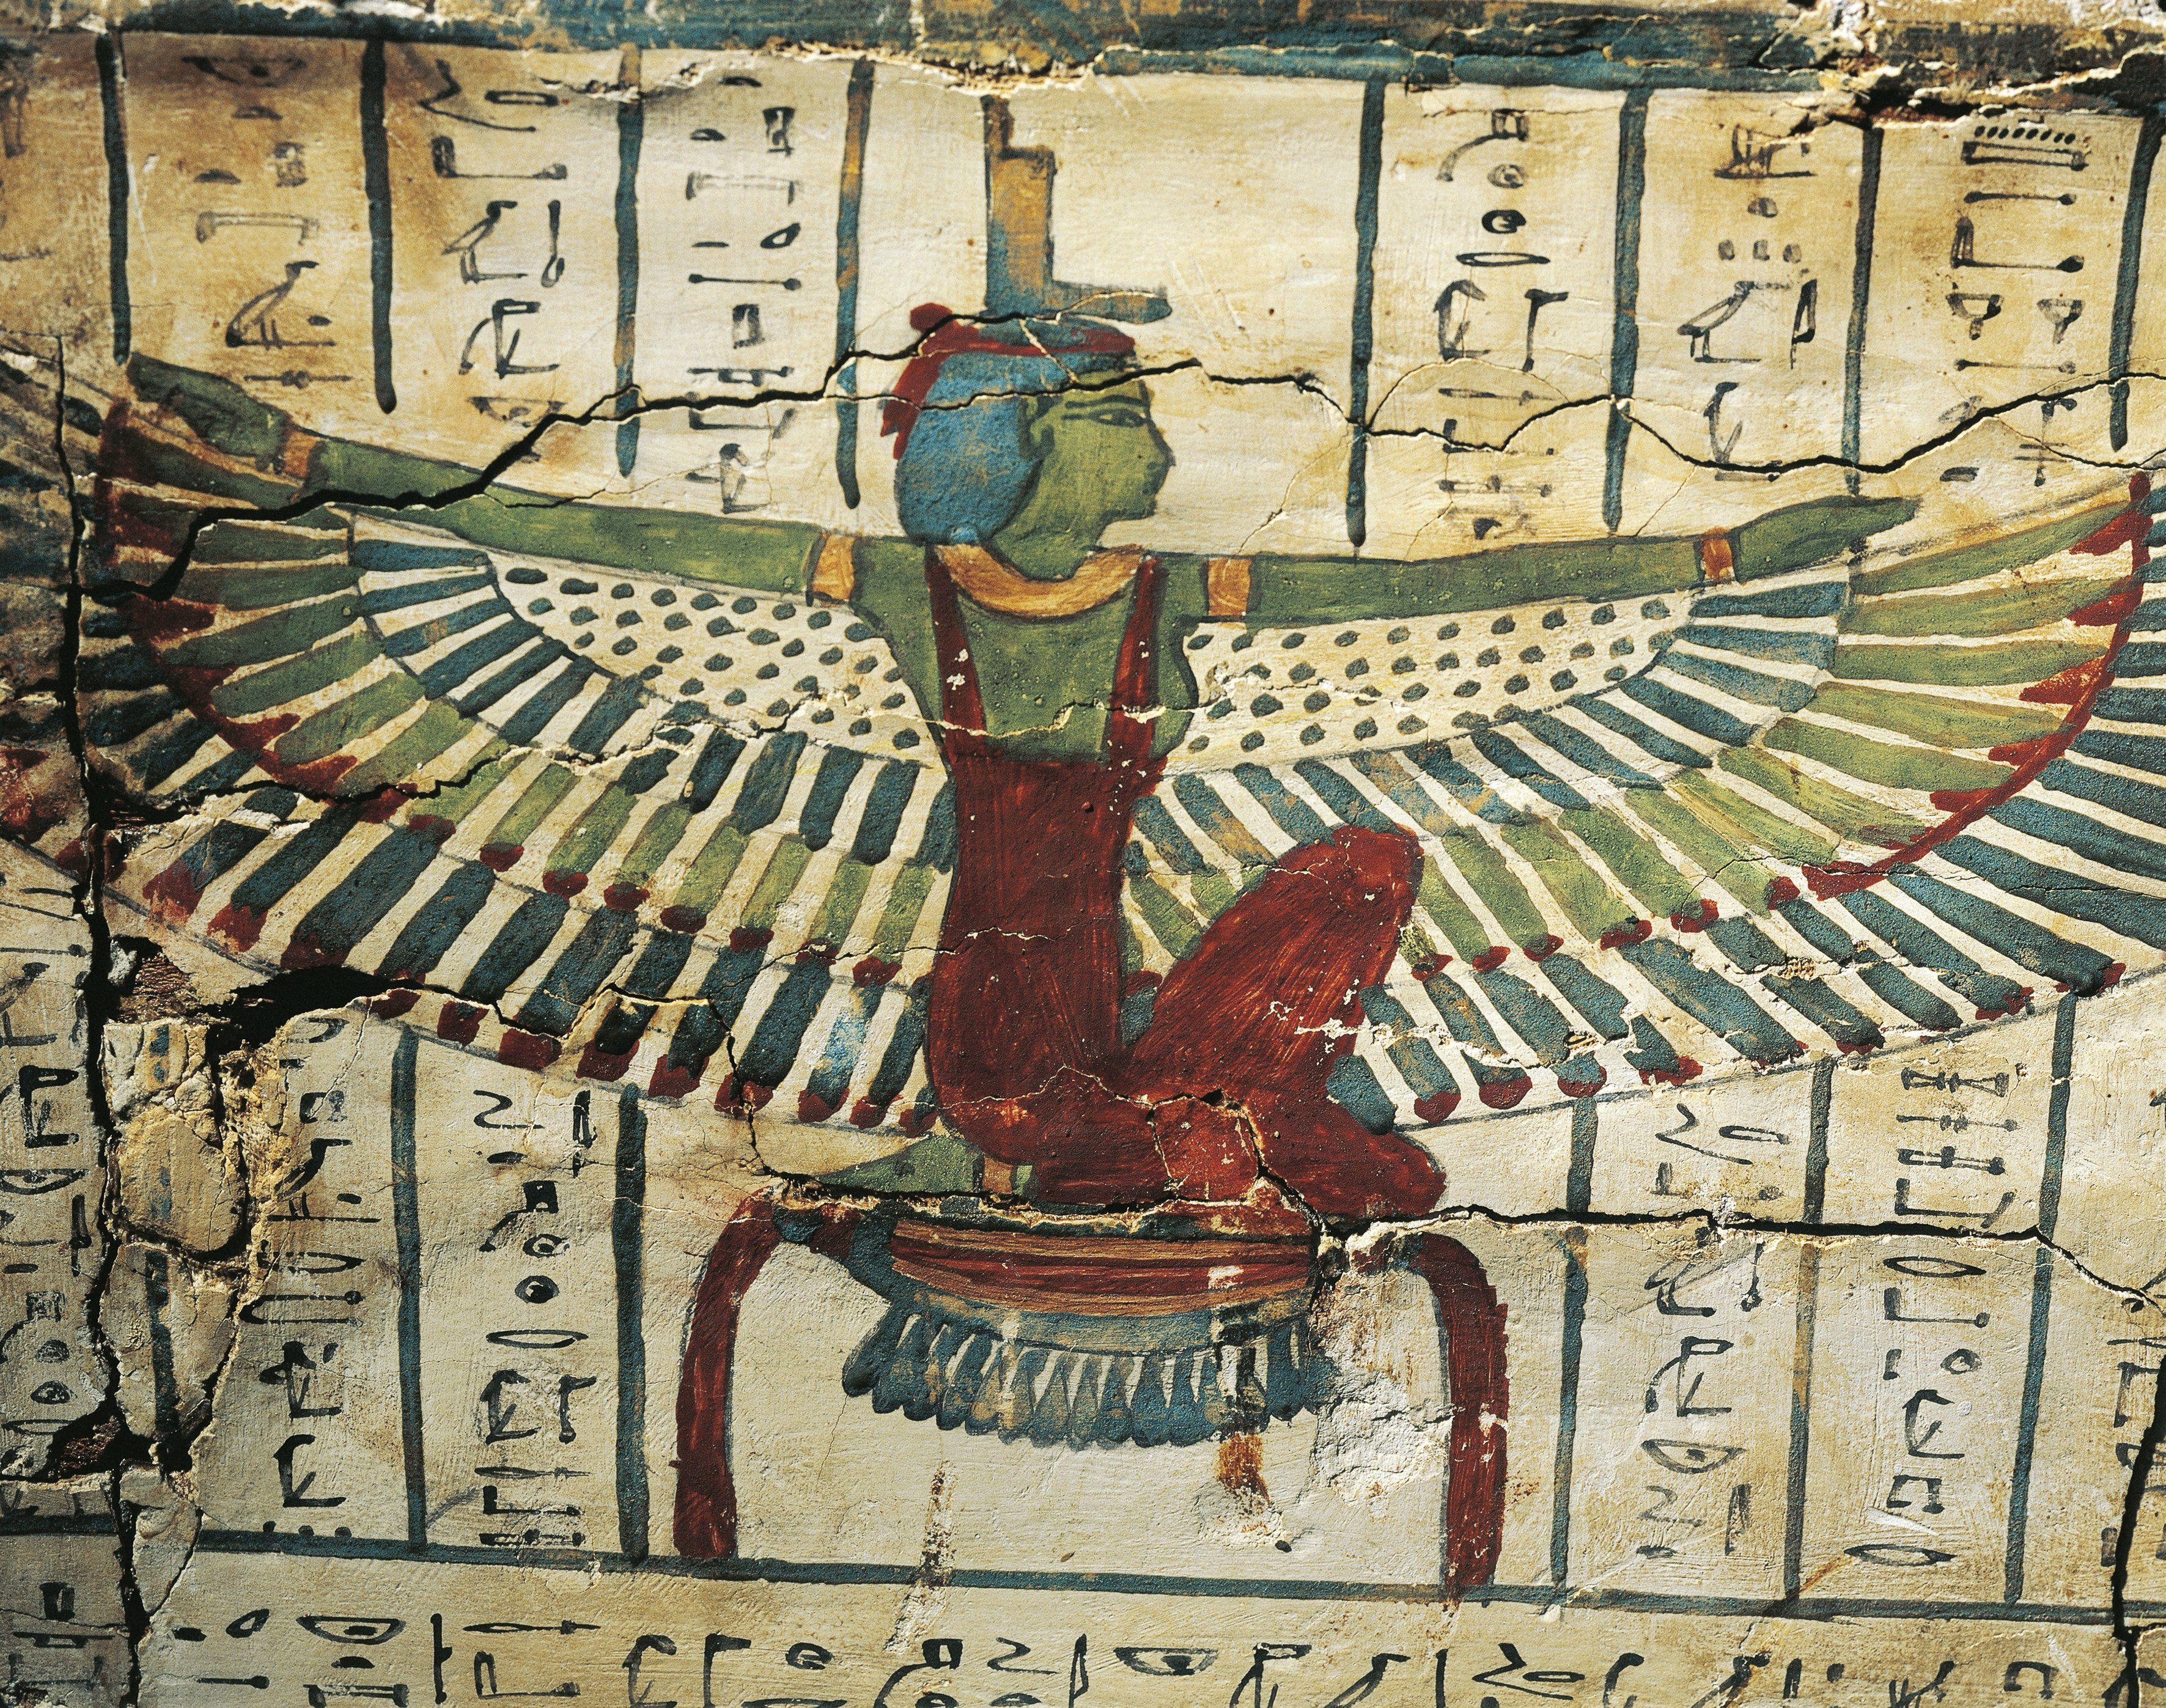 Hieroglyphic painting depicting Goddess Isis.